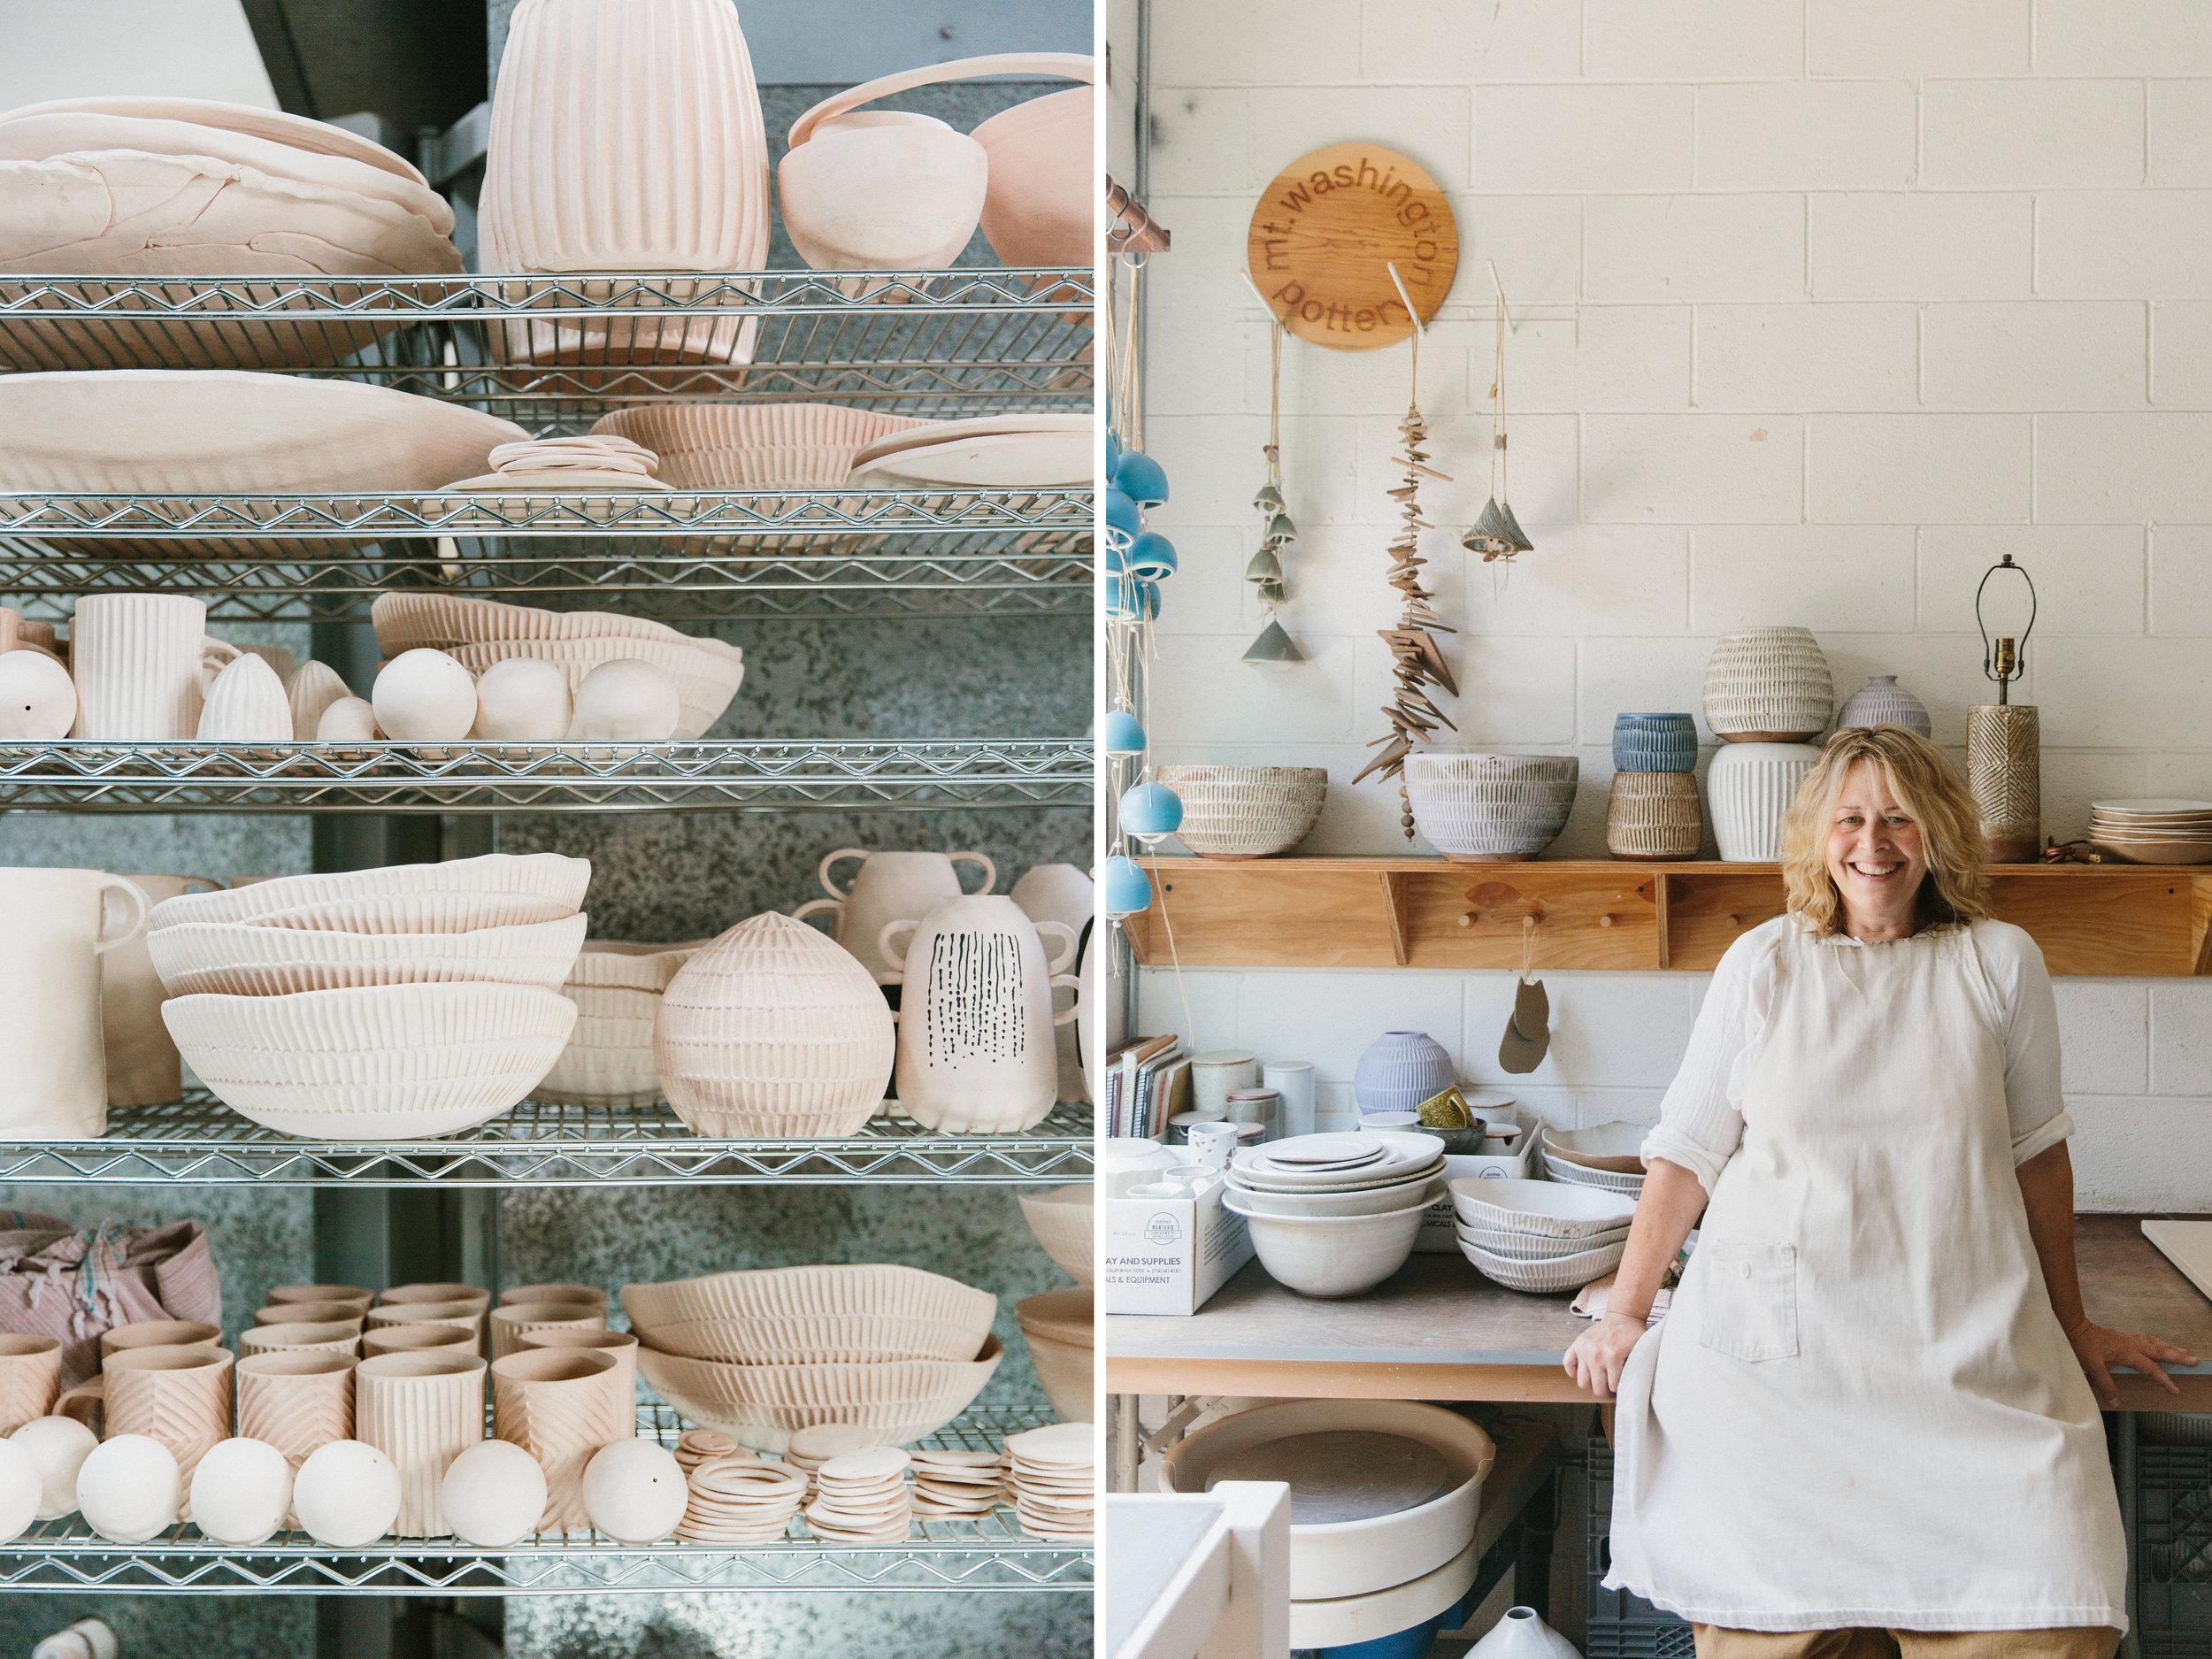 mt-washington-pottery_jenni-kayne_los-angeles-editorial-studio-home-tour_nicki-sebastian_4.jpg